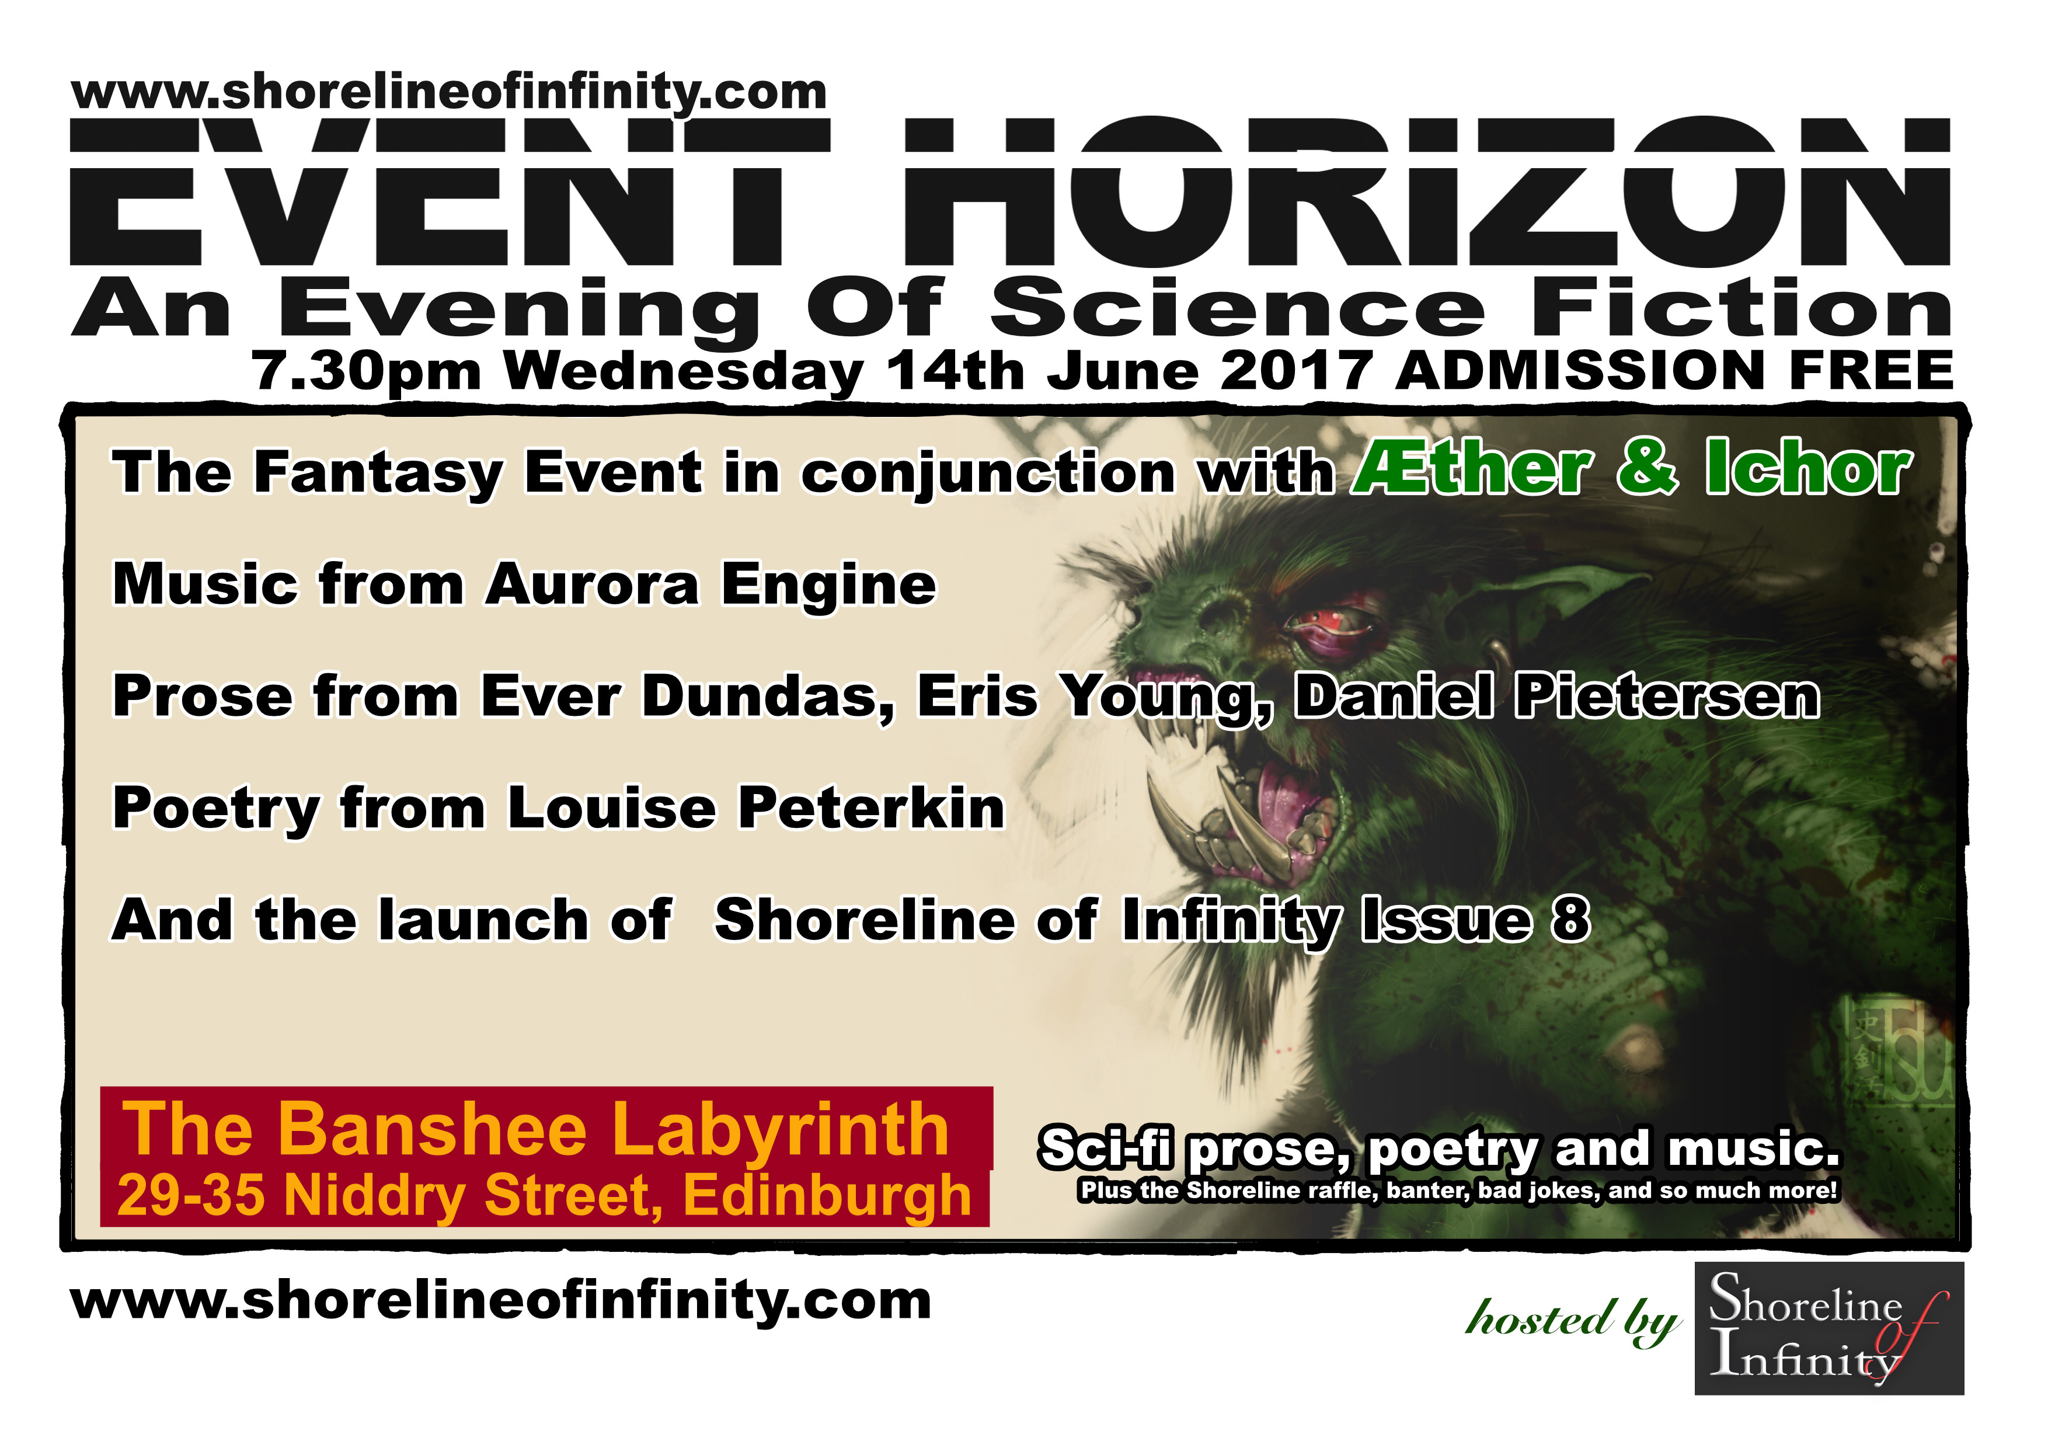 Shoreline of Infinity's Event Horizon 14th June 2017